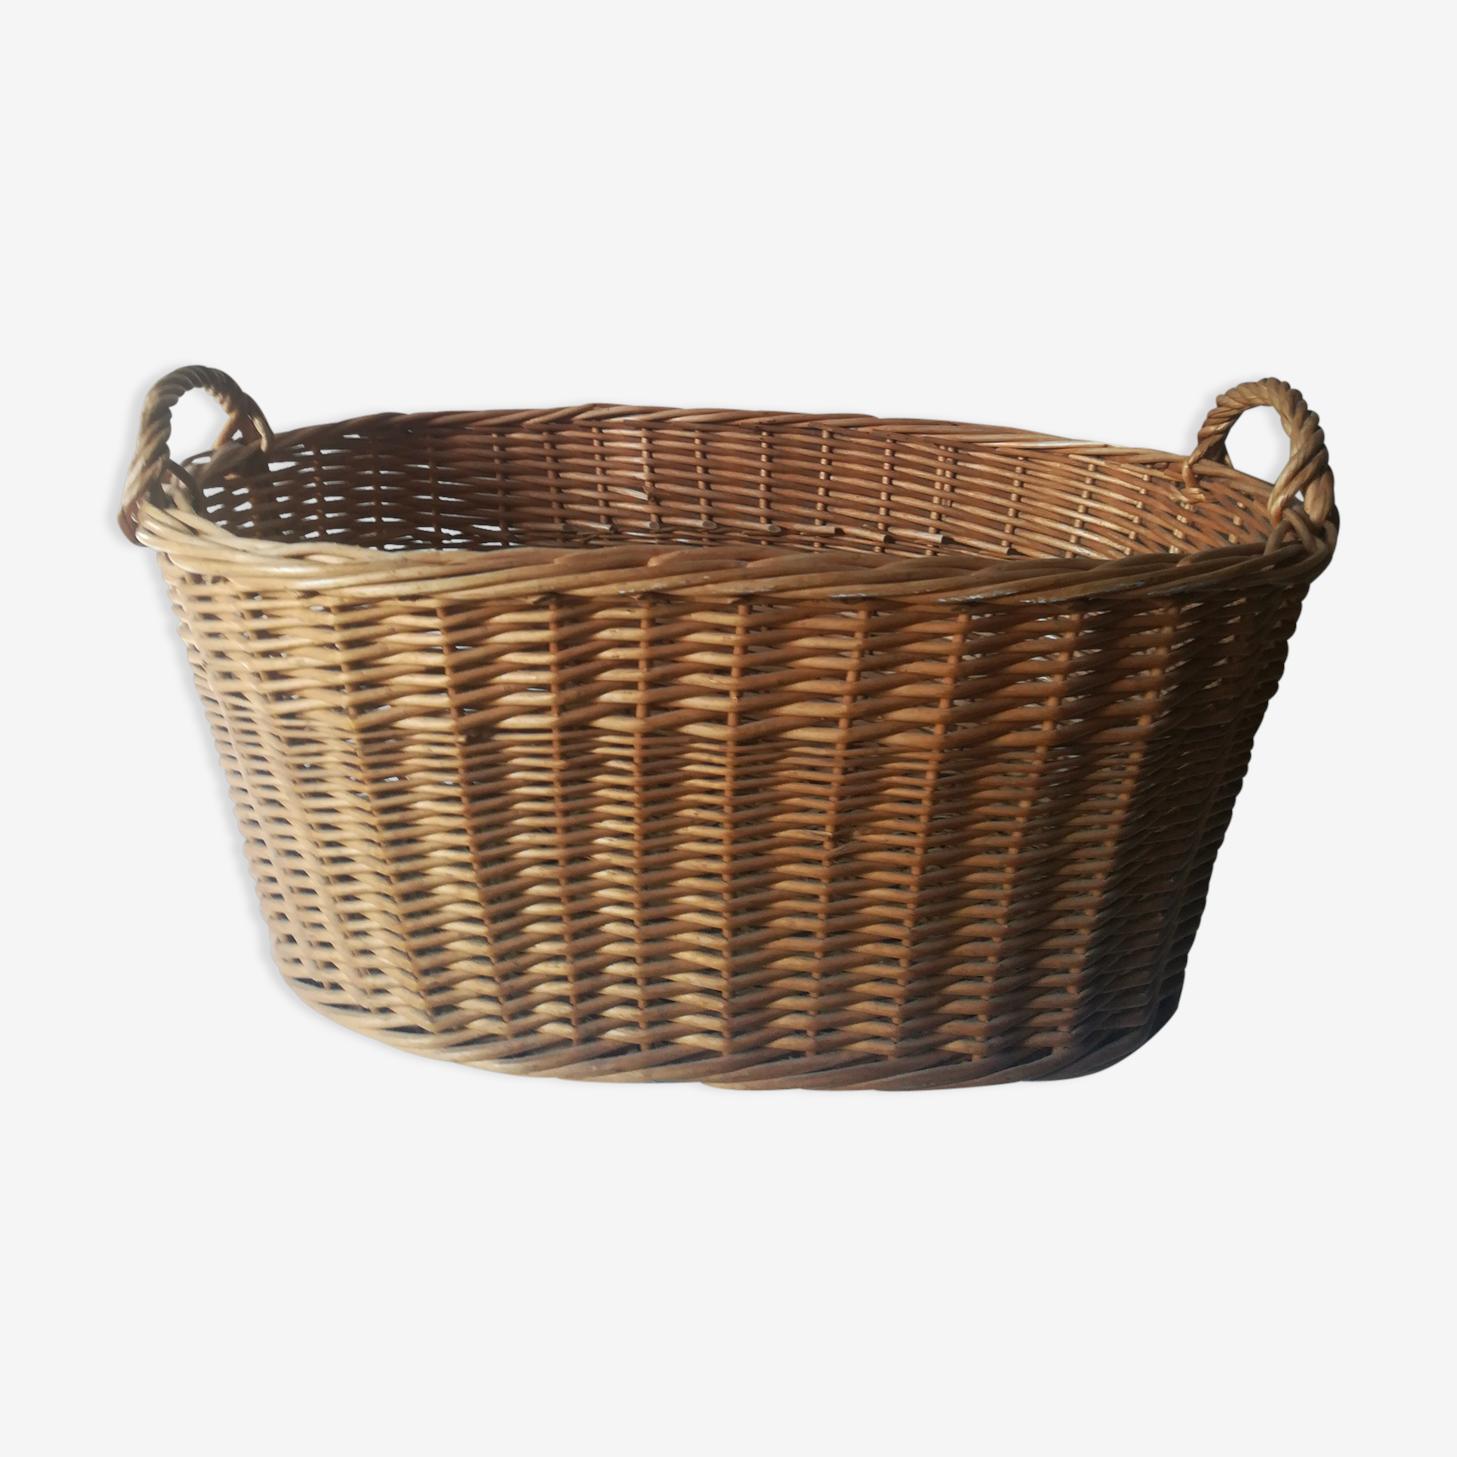 A wicker laundry basket has handles